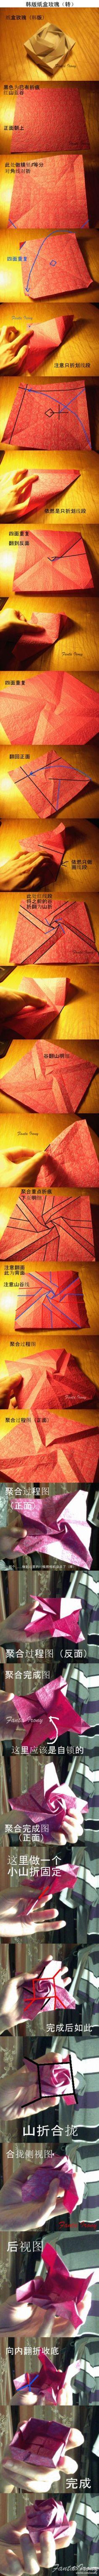 240 Best Origami Images On Pinterest Paper Engineering Science Fiction Diagrams Rose Box By Diyforever Envelope Diy